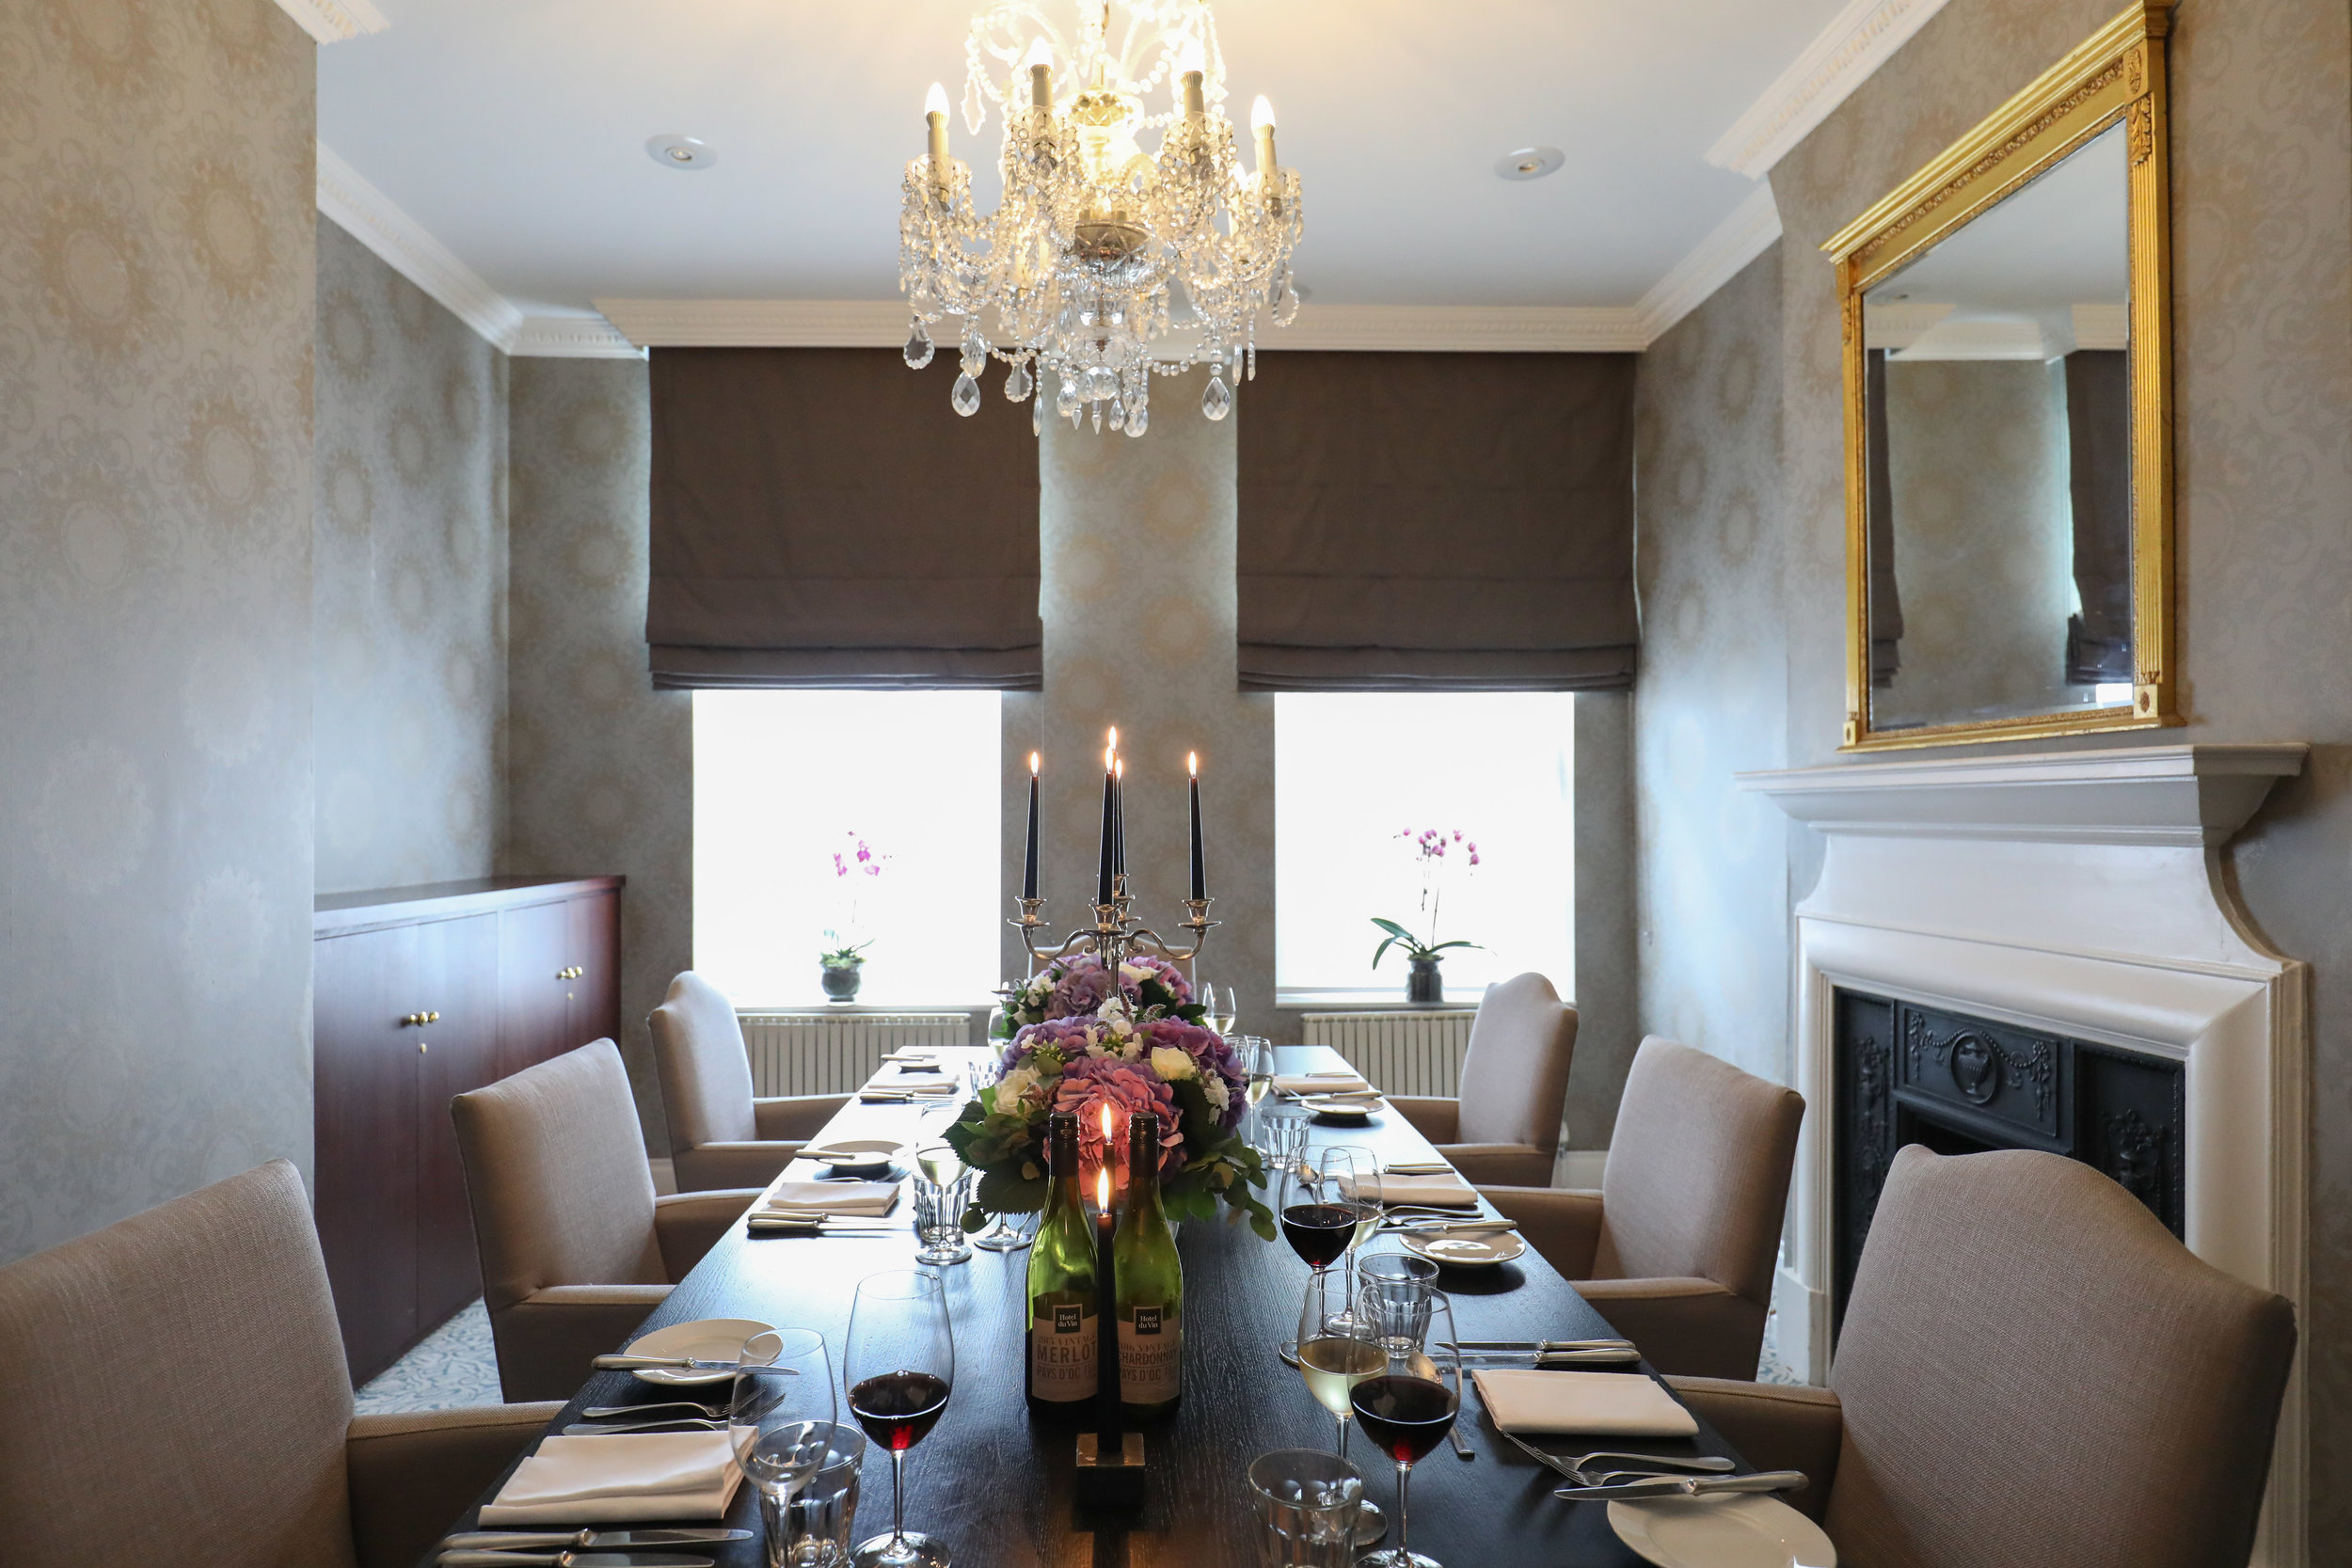 Lallier room cannizaro house wimbledon tennis vip lunch hospitality